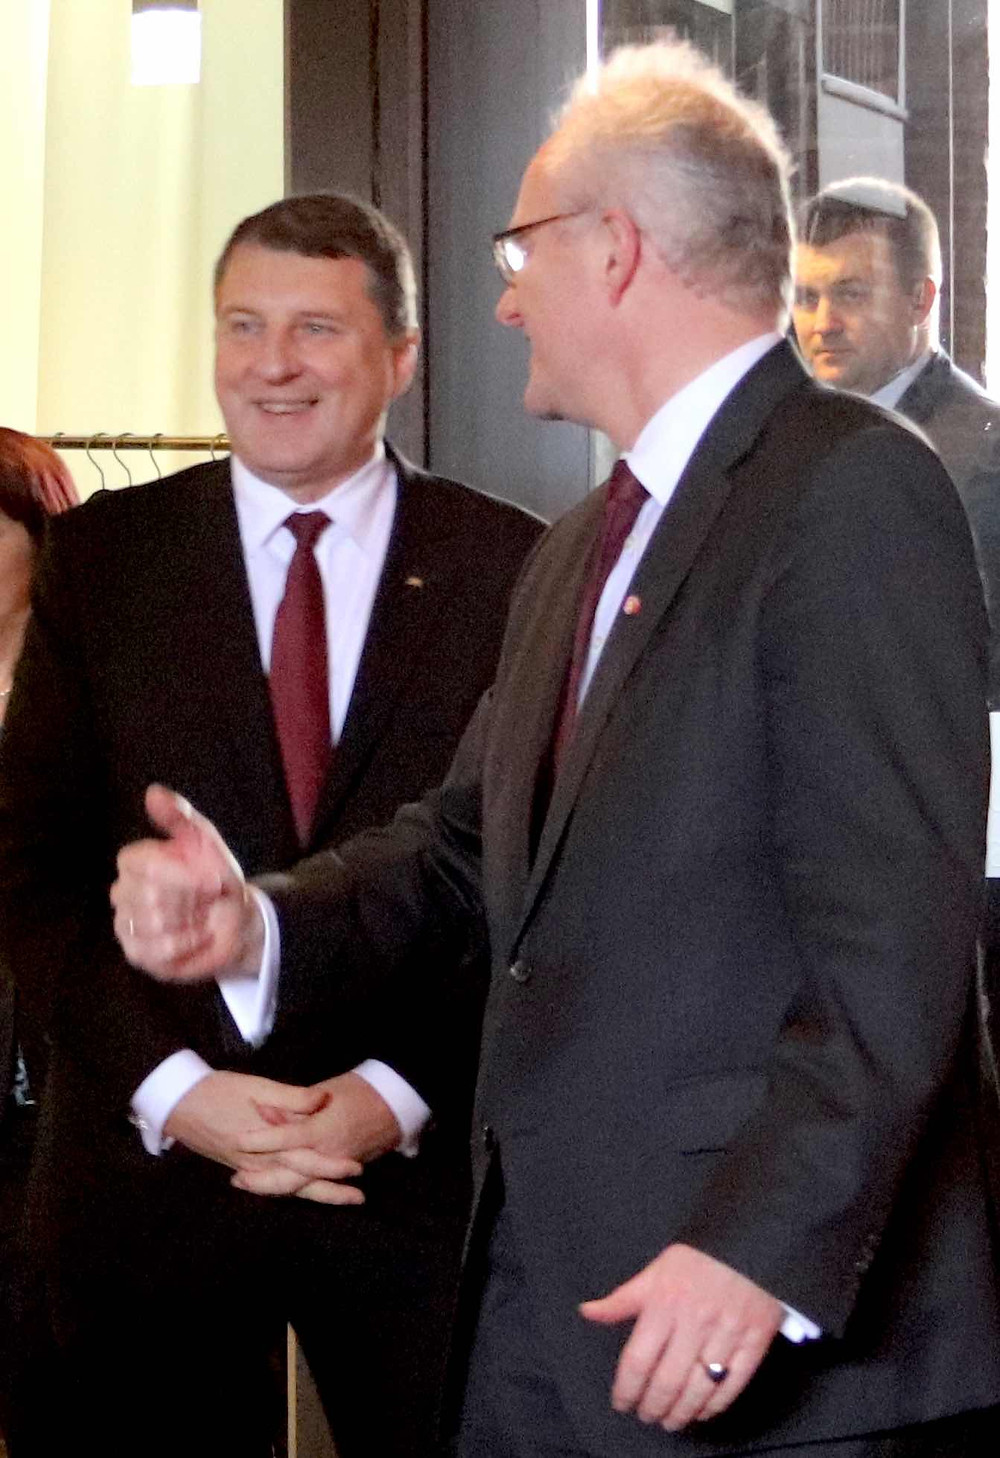 Thomas von Lüpke begrüßt den Präsidenten Lettlands Raimonds Vējonis im Brömsehaus